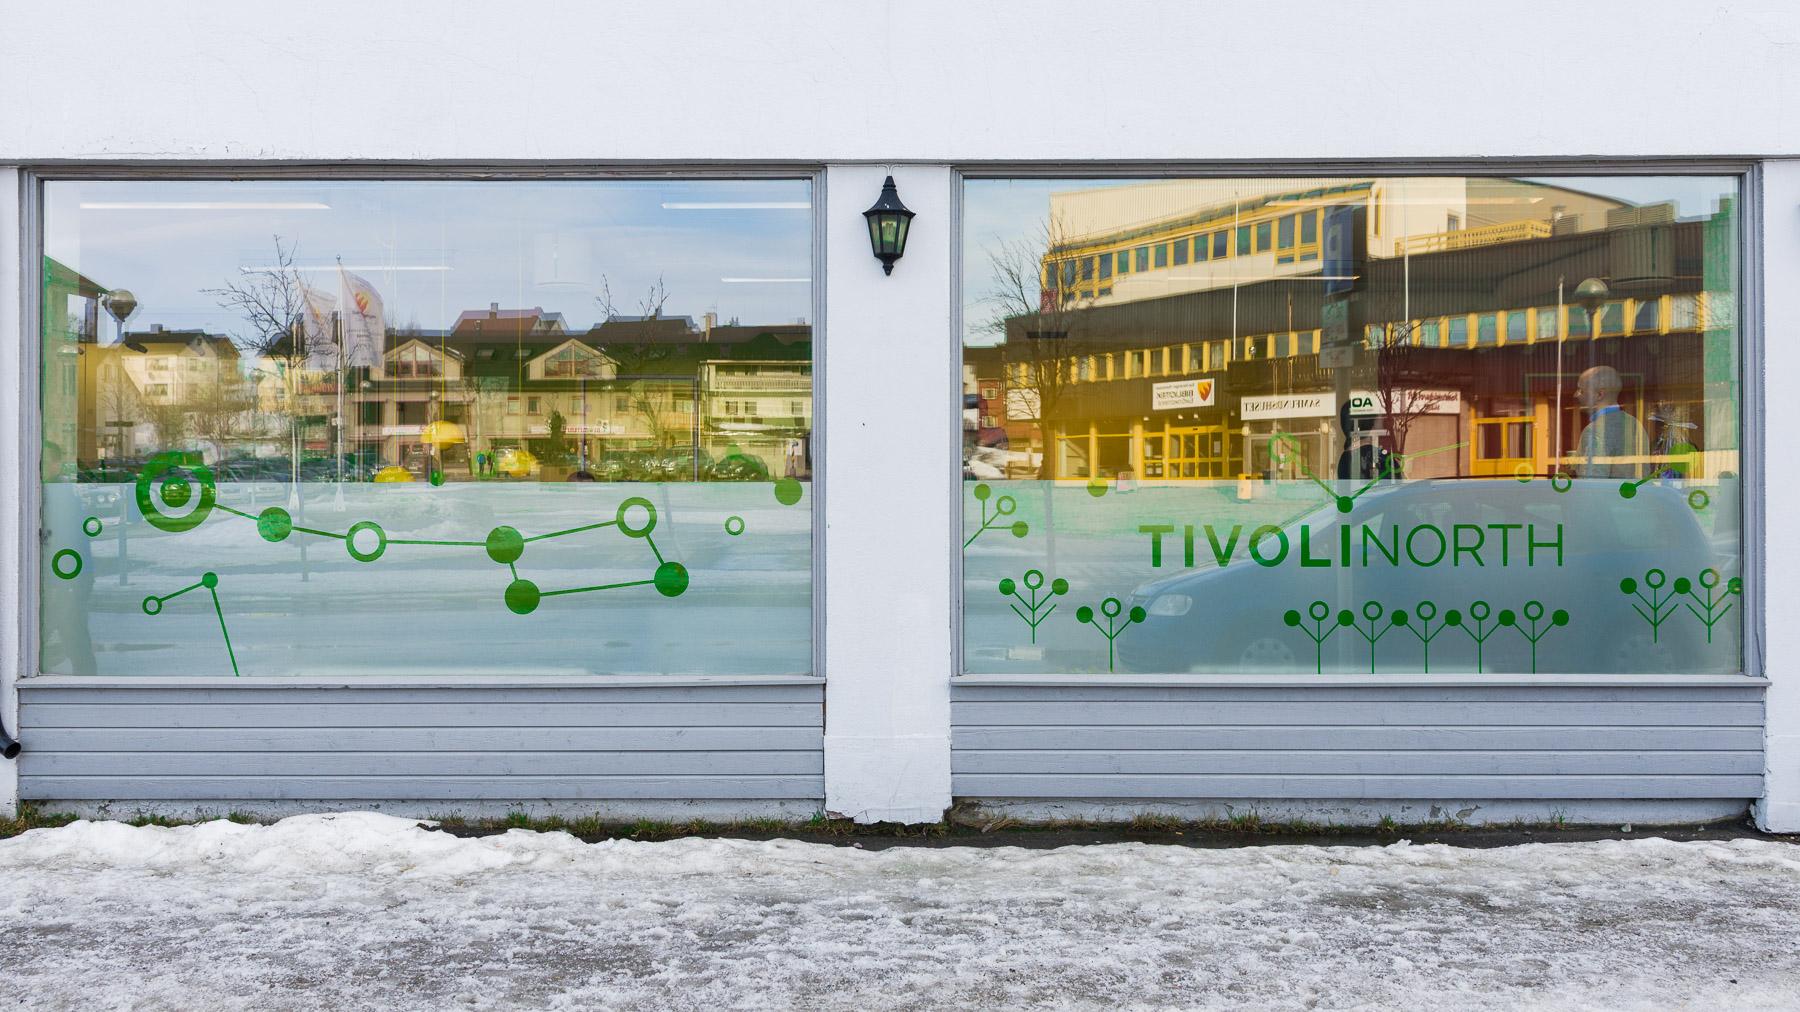 Tivoli North 2.0